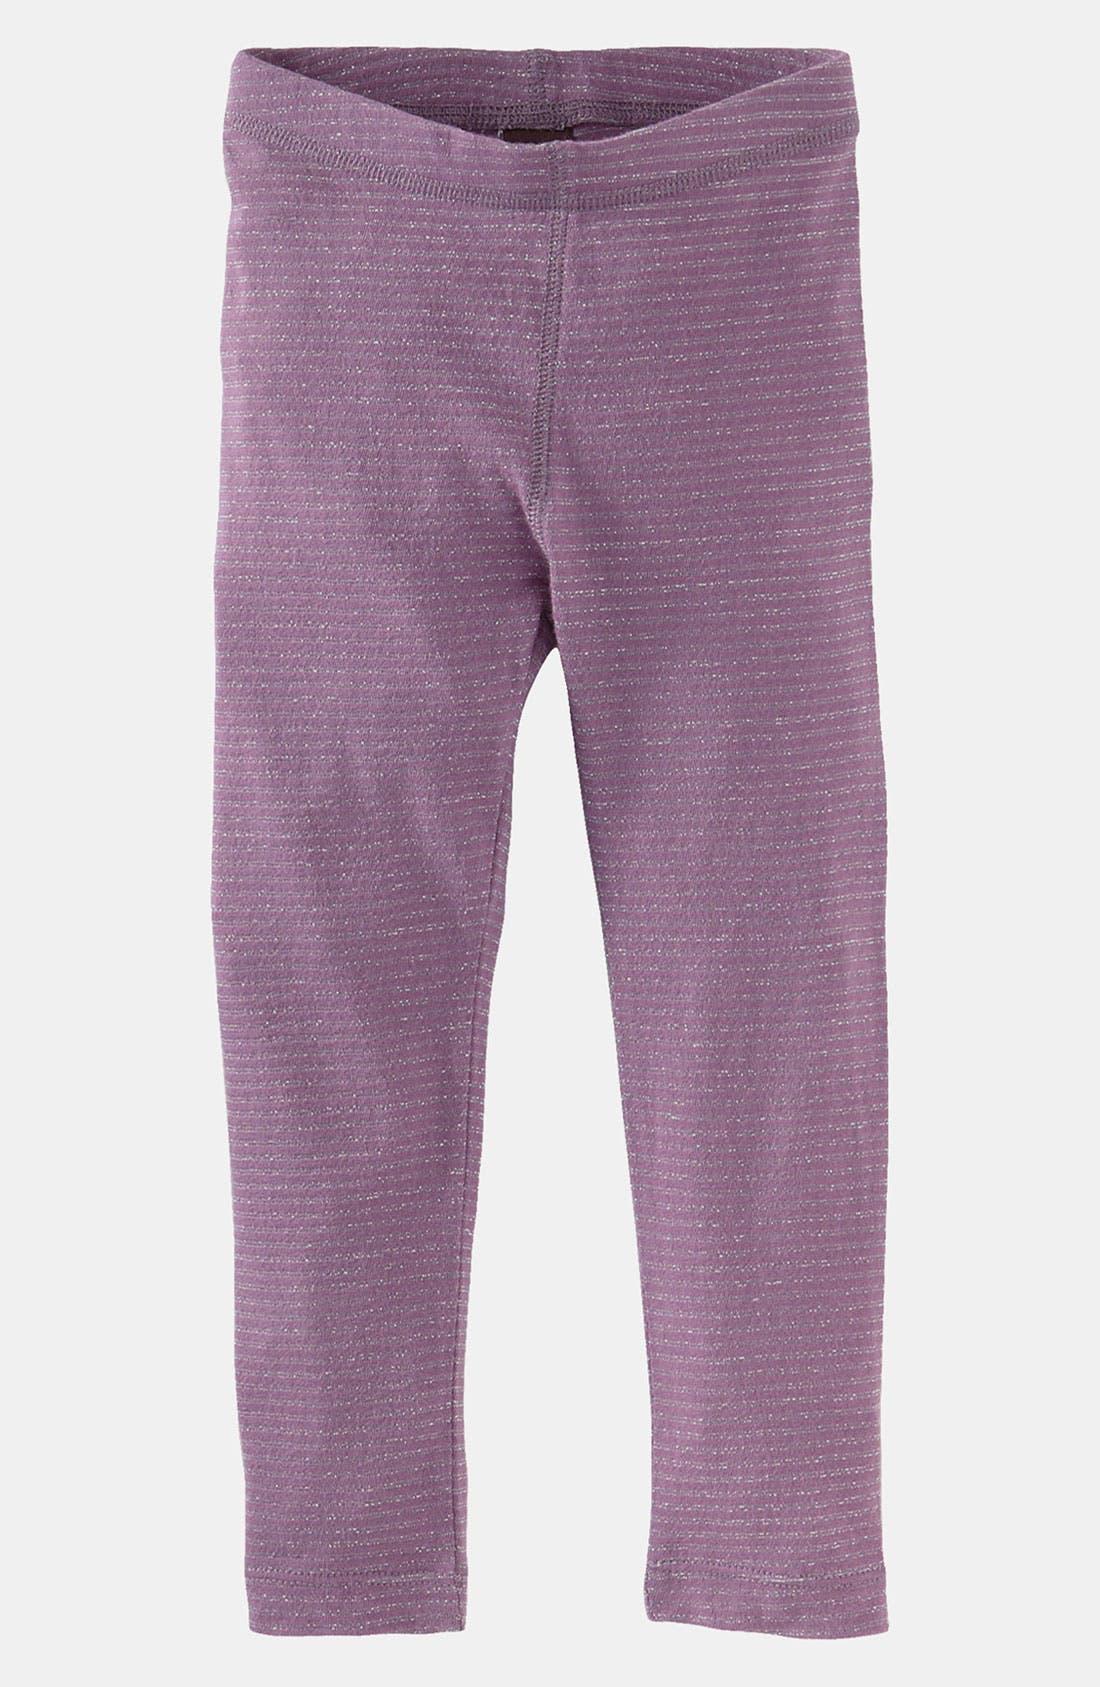 Alternate Image 1 Selected - Tea Collection 'Sparkle Stripe' Leggings (Infant)